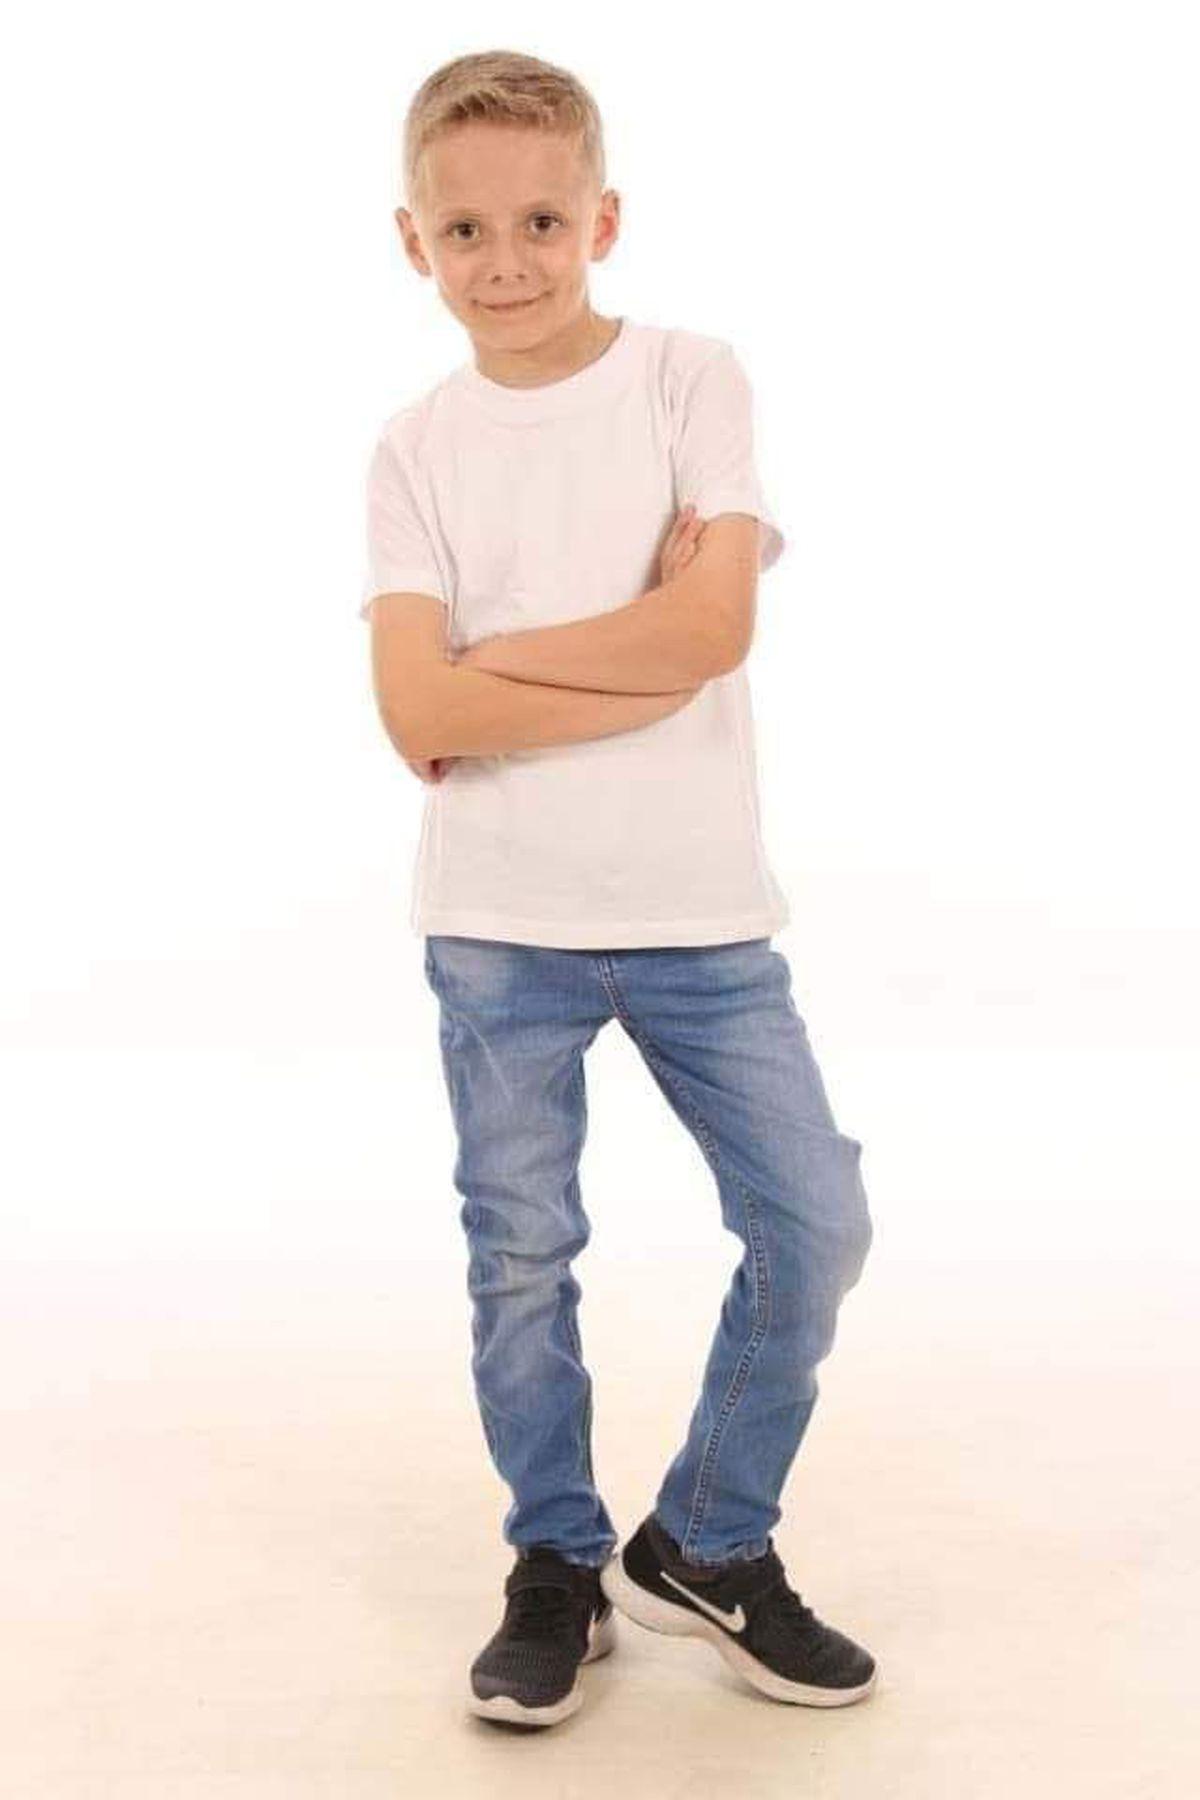 Sam Wiggins, 10, from Malpas